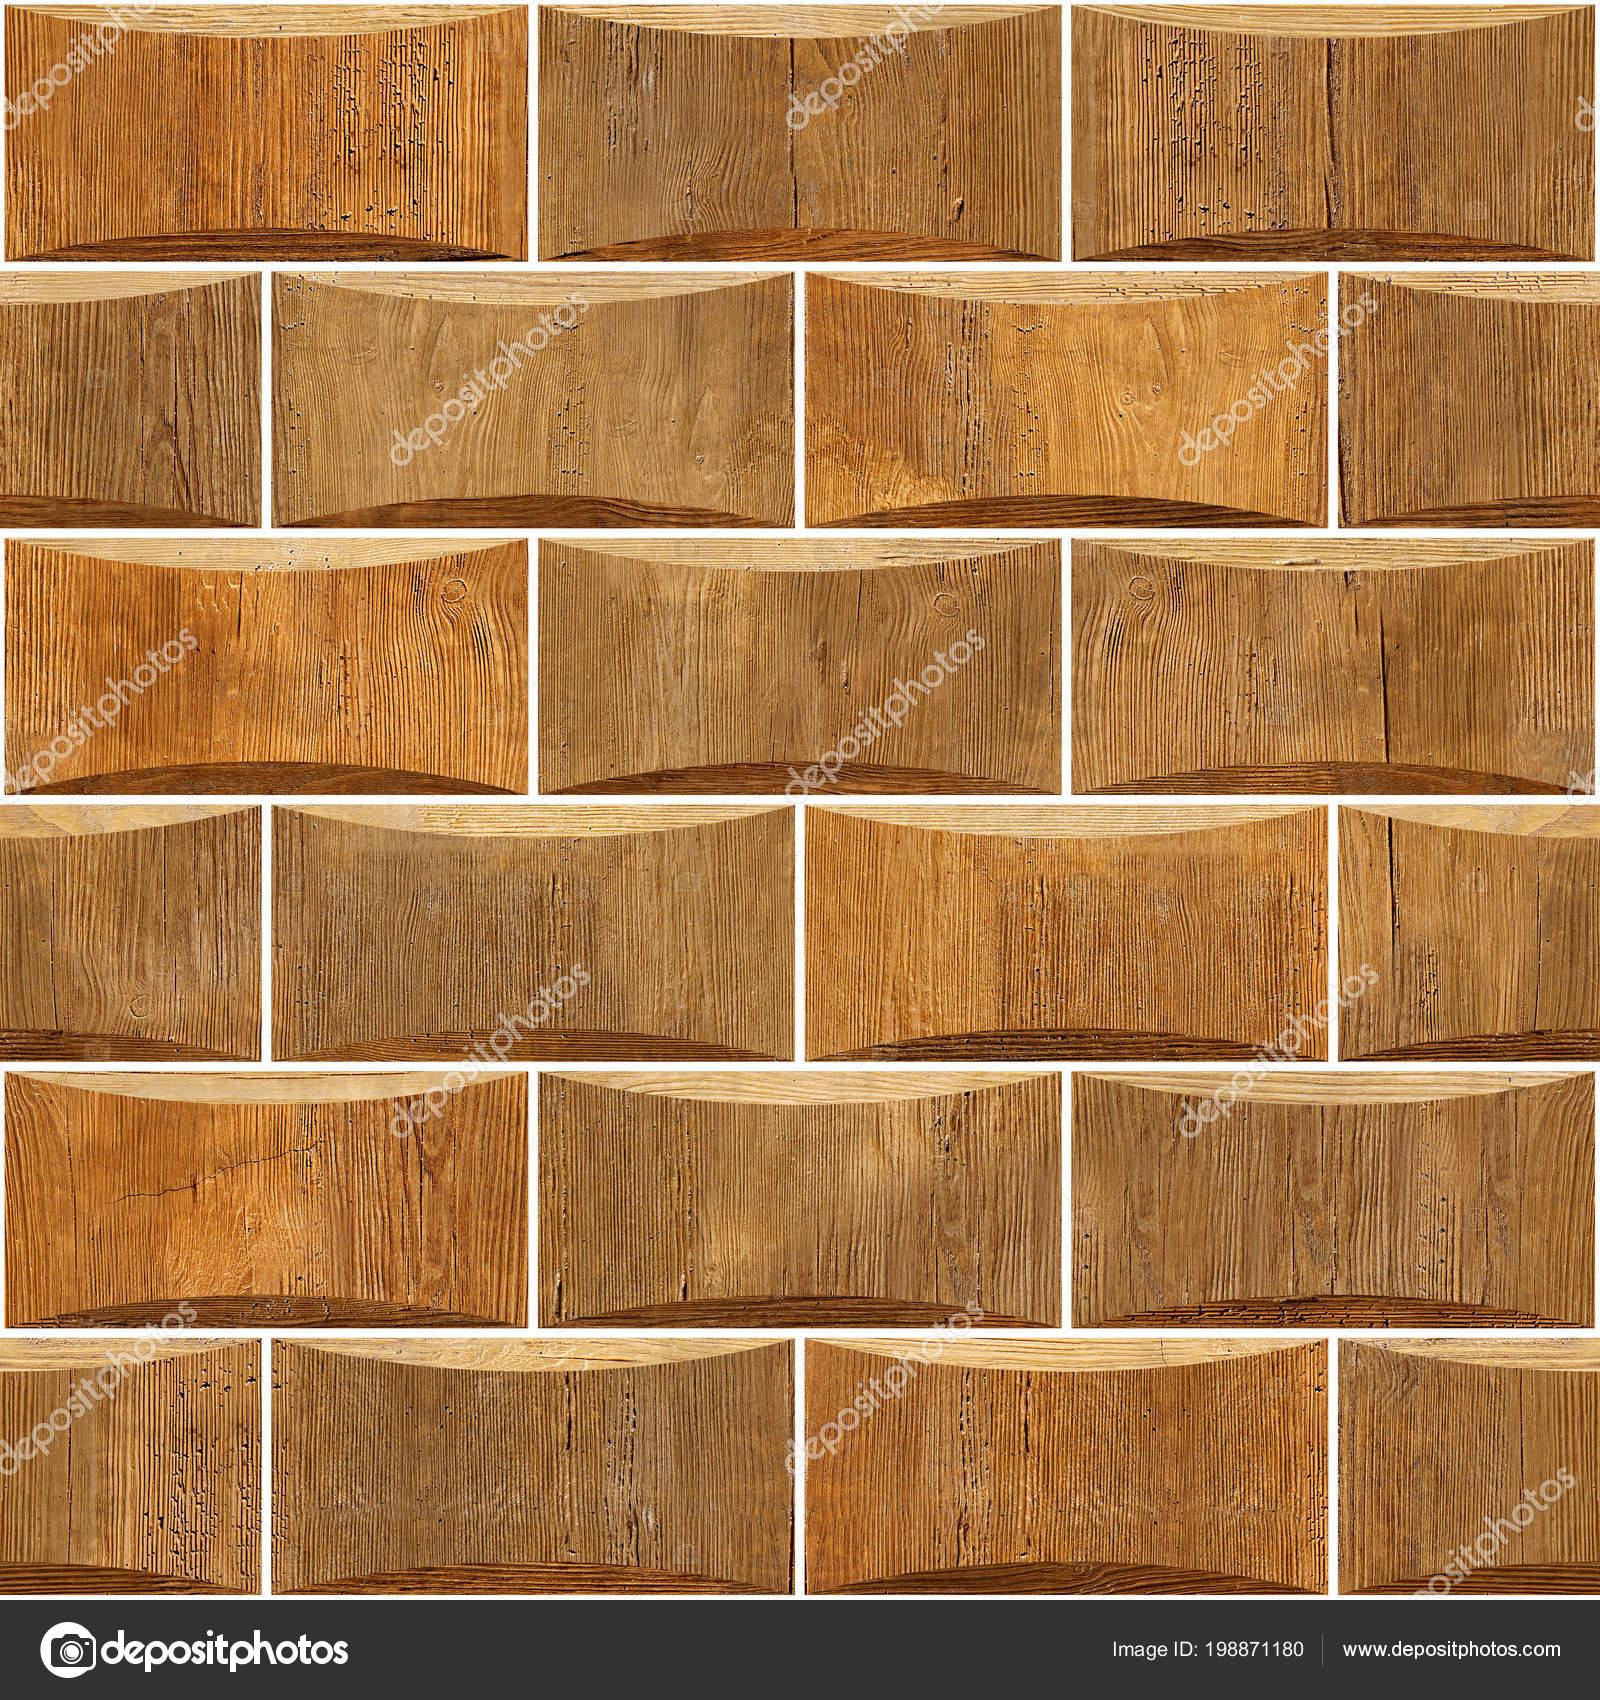 Decorative Wooden Bricks Interior Wall Decoration Abstract Paneling